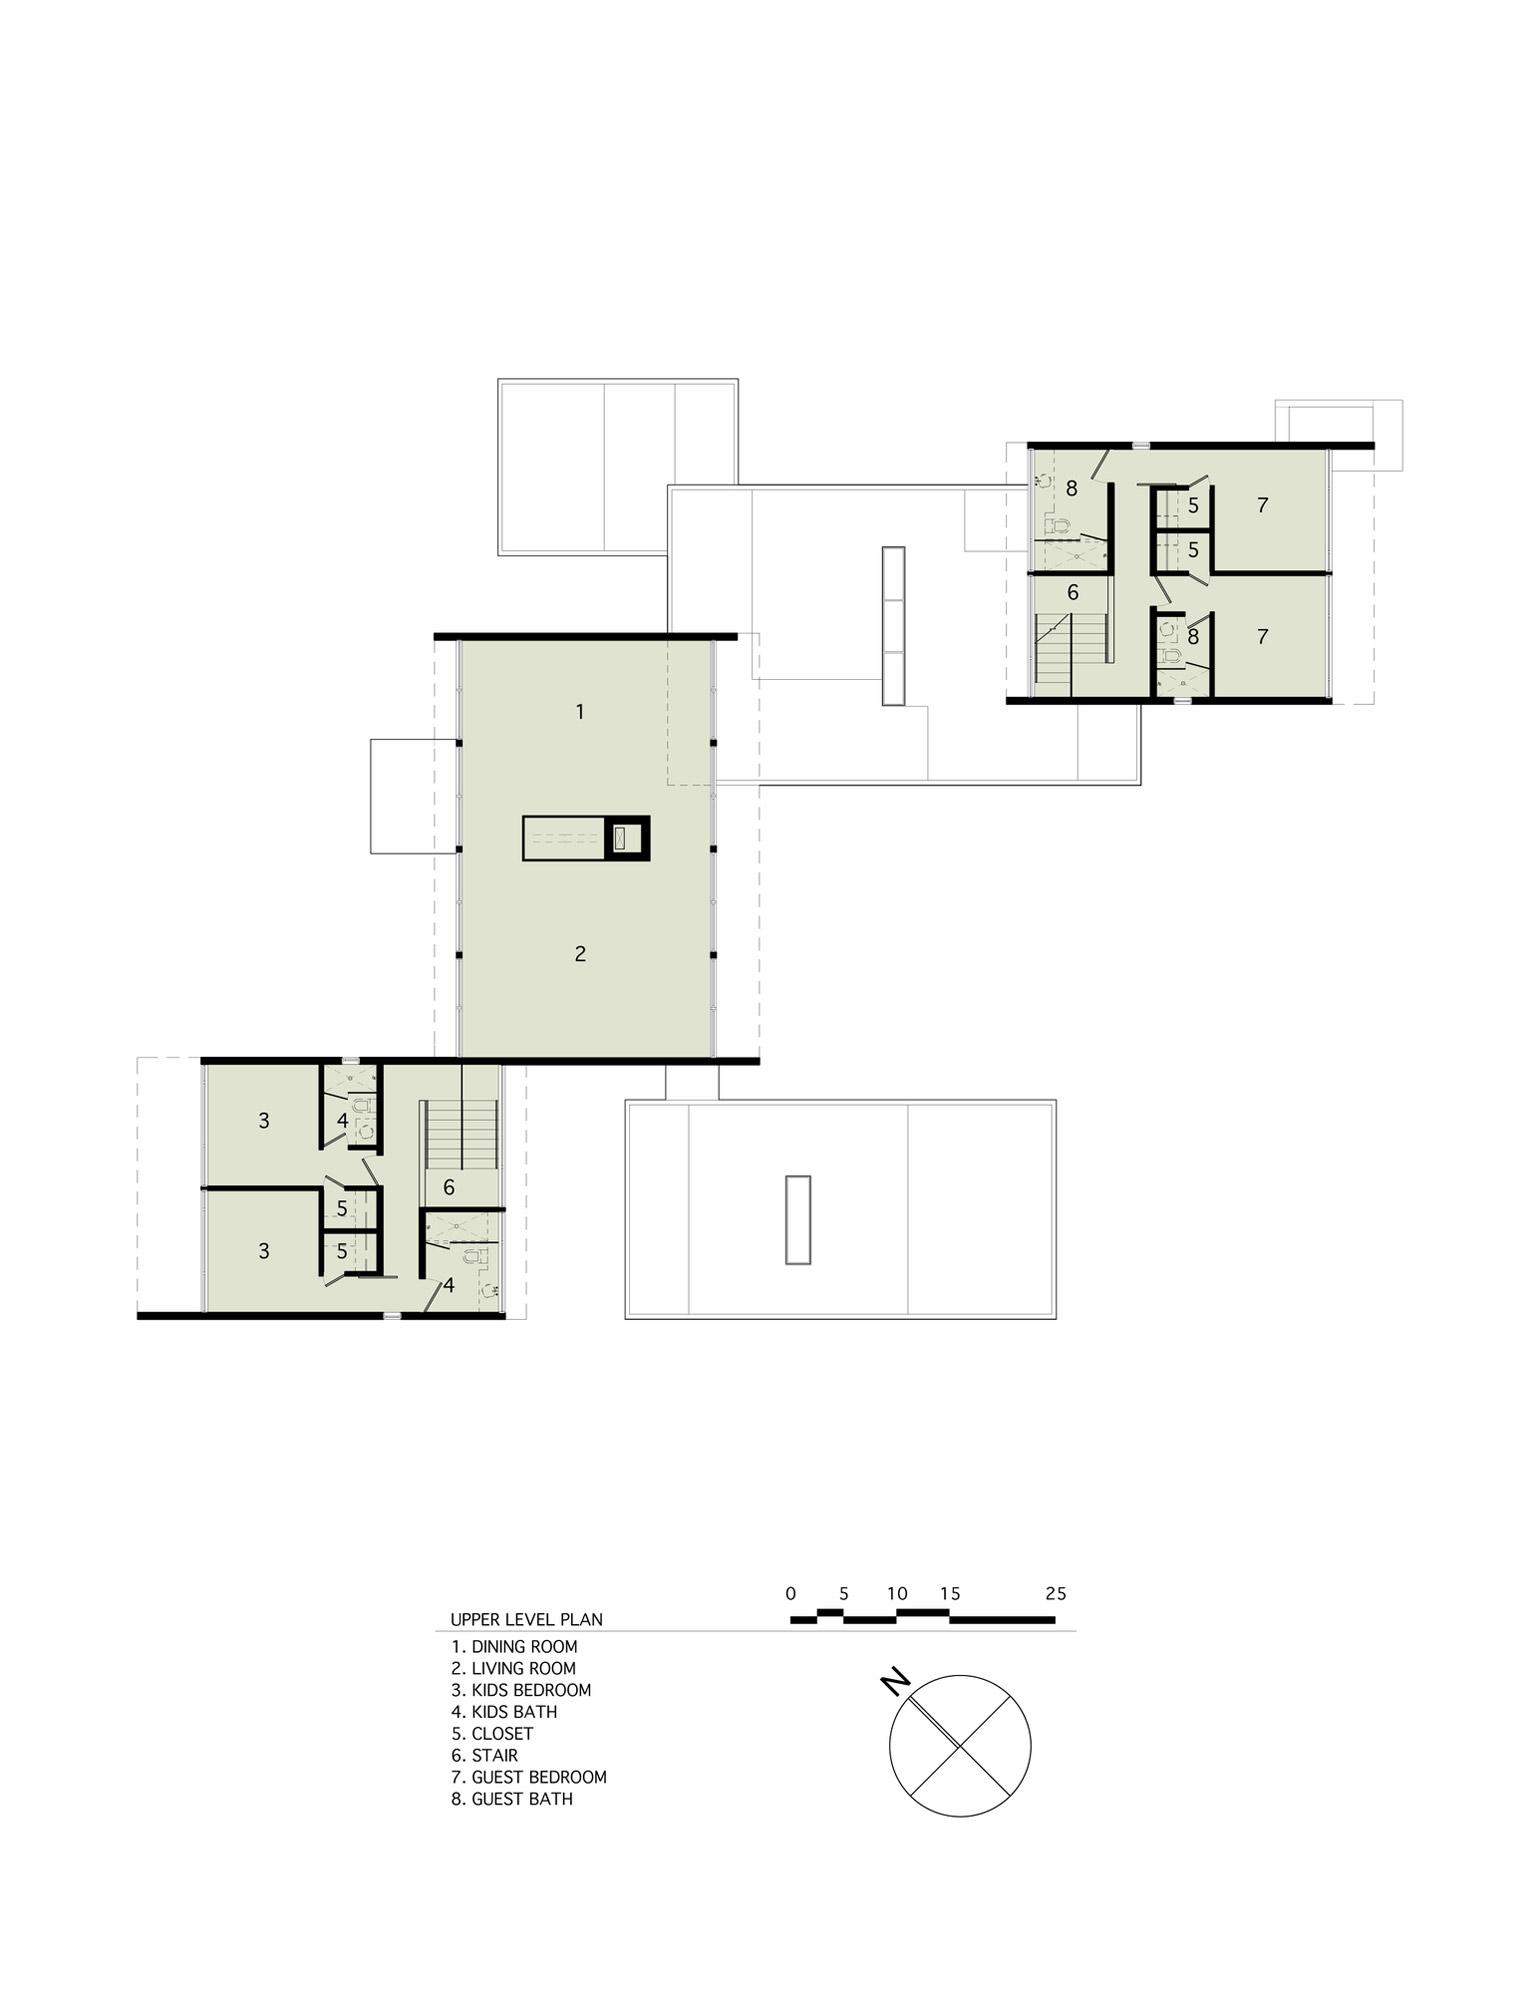 Upper Level Floor Plan, Sam's Creek in Bridgehampton, New York by Bates Masi Architects